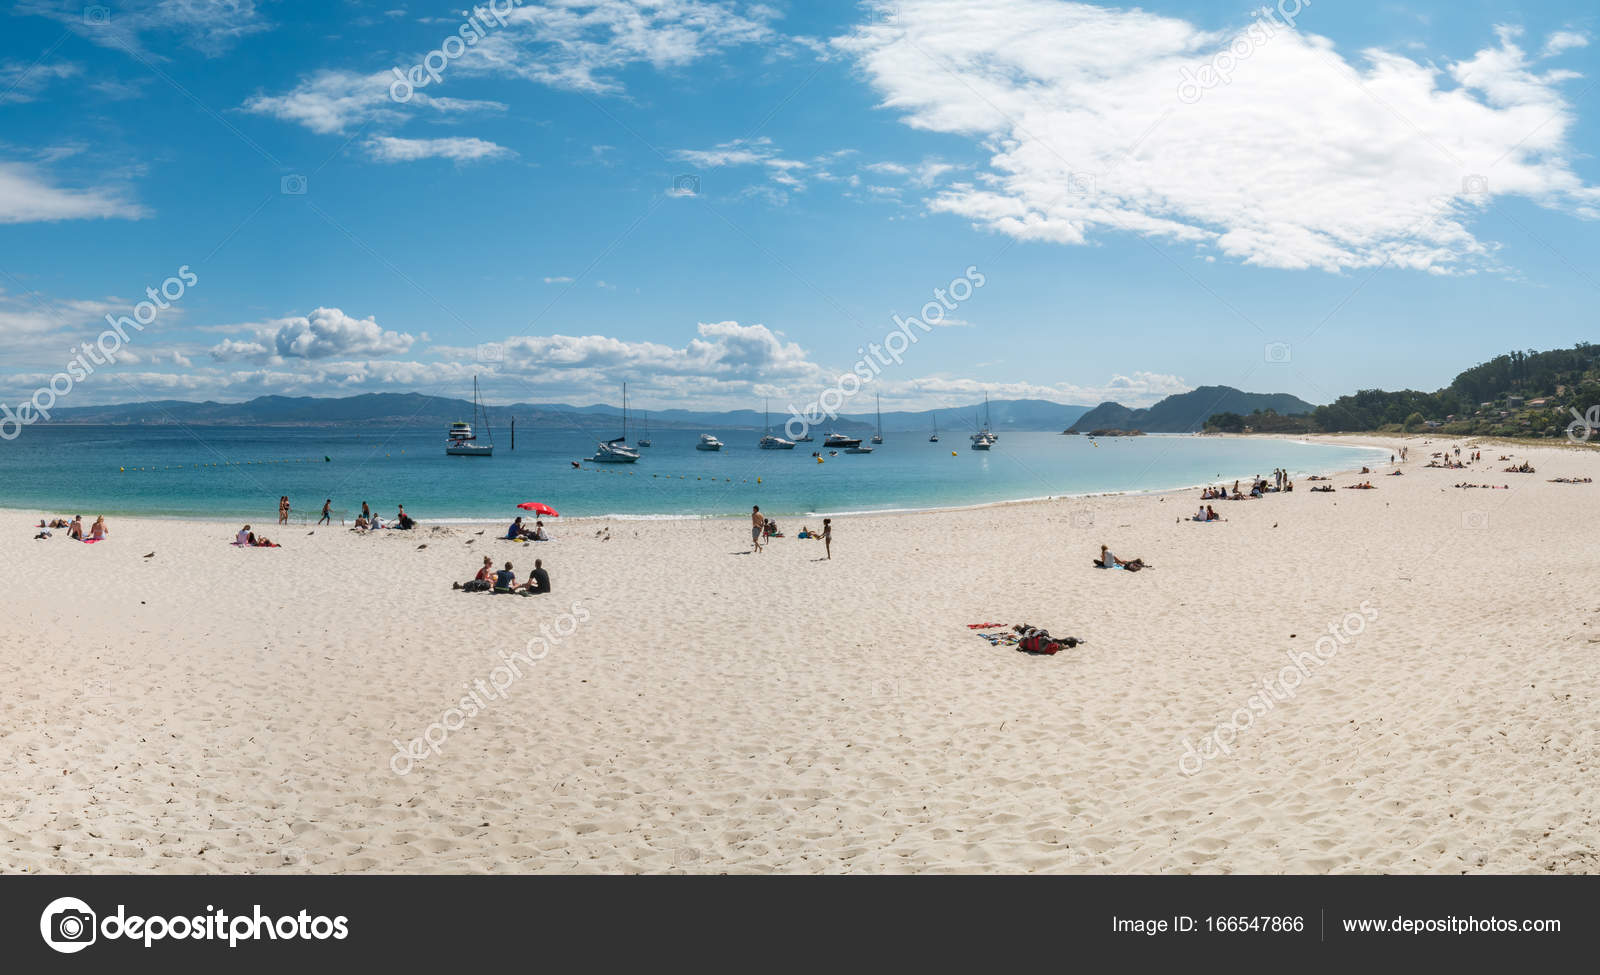 playa de rodas cies islands spain